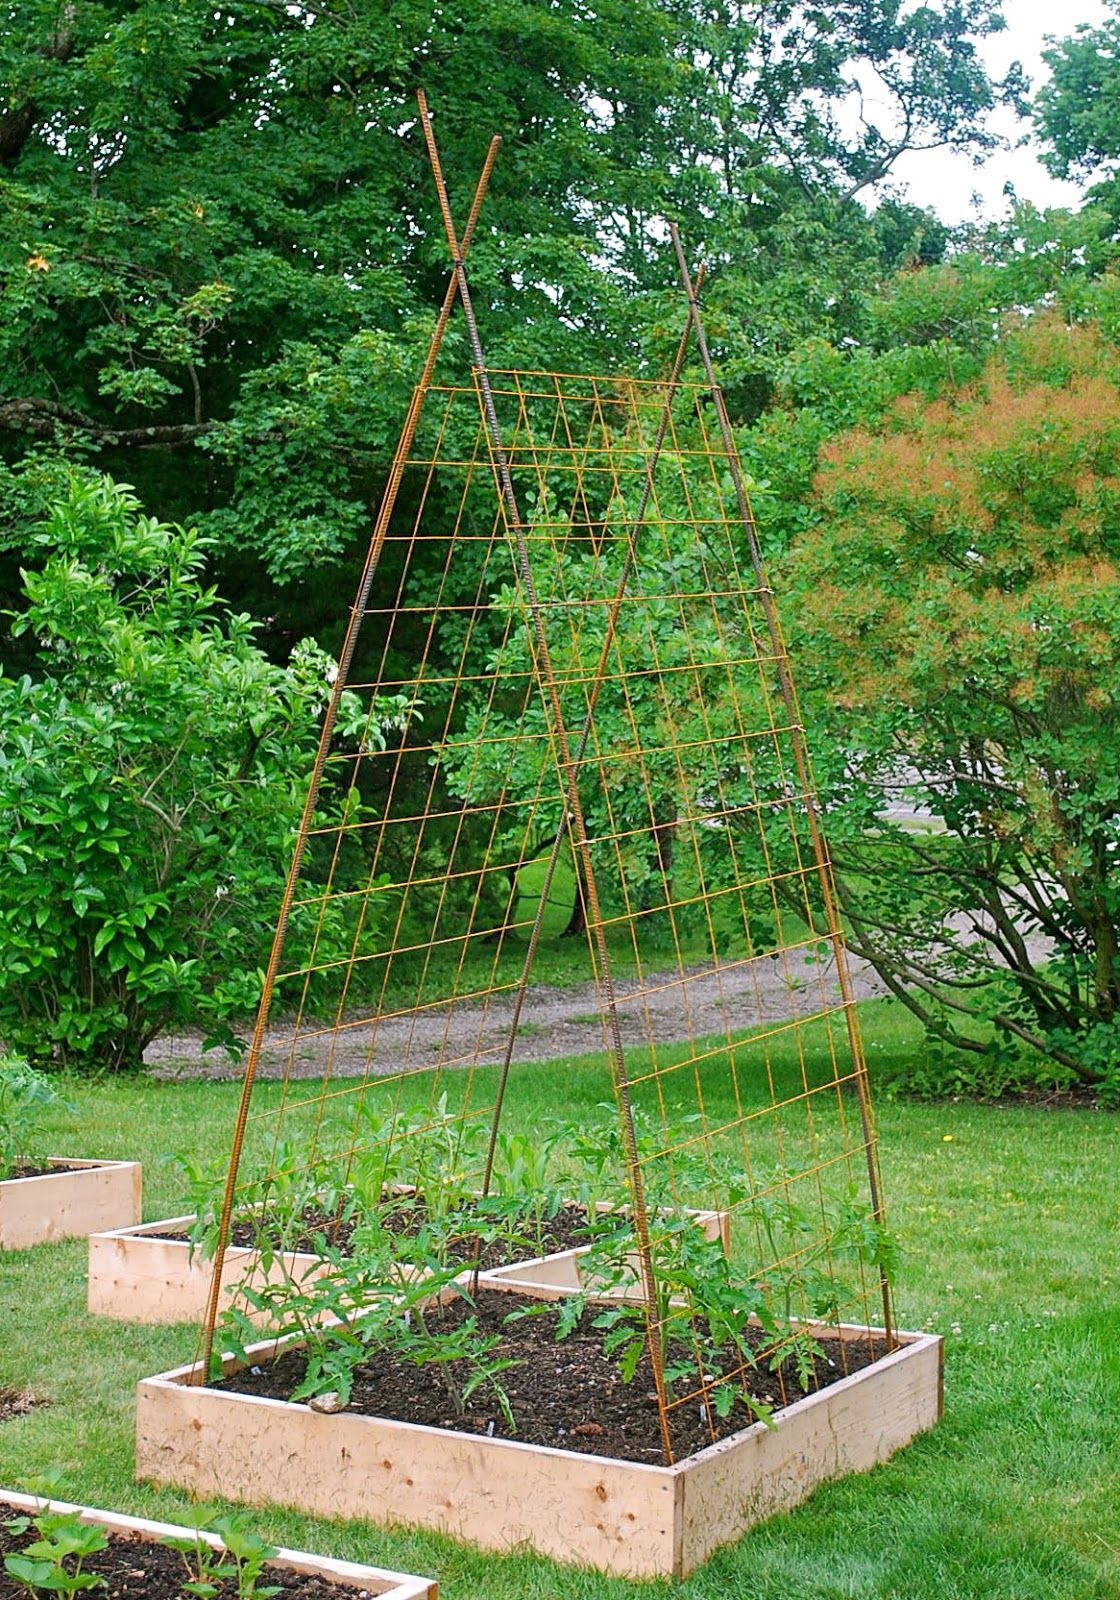 Building Tomato Trellises From Rebar And Remesh Tomato Trellis